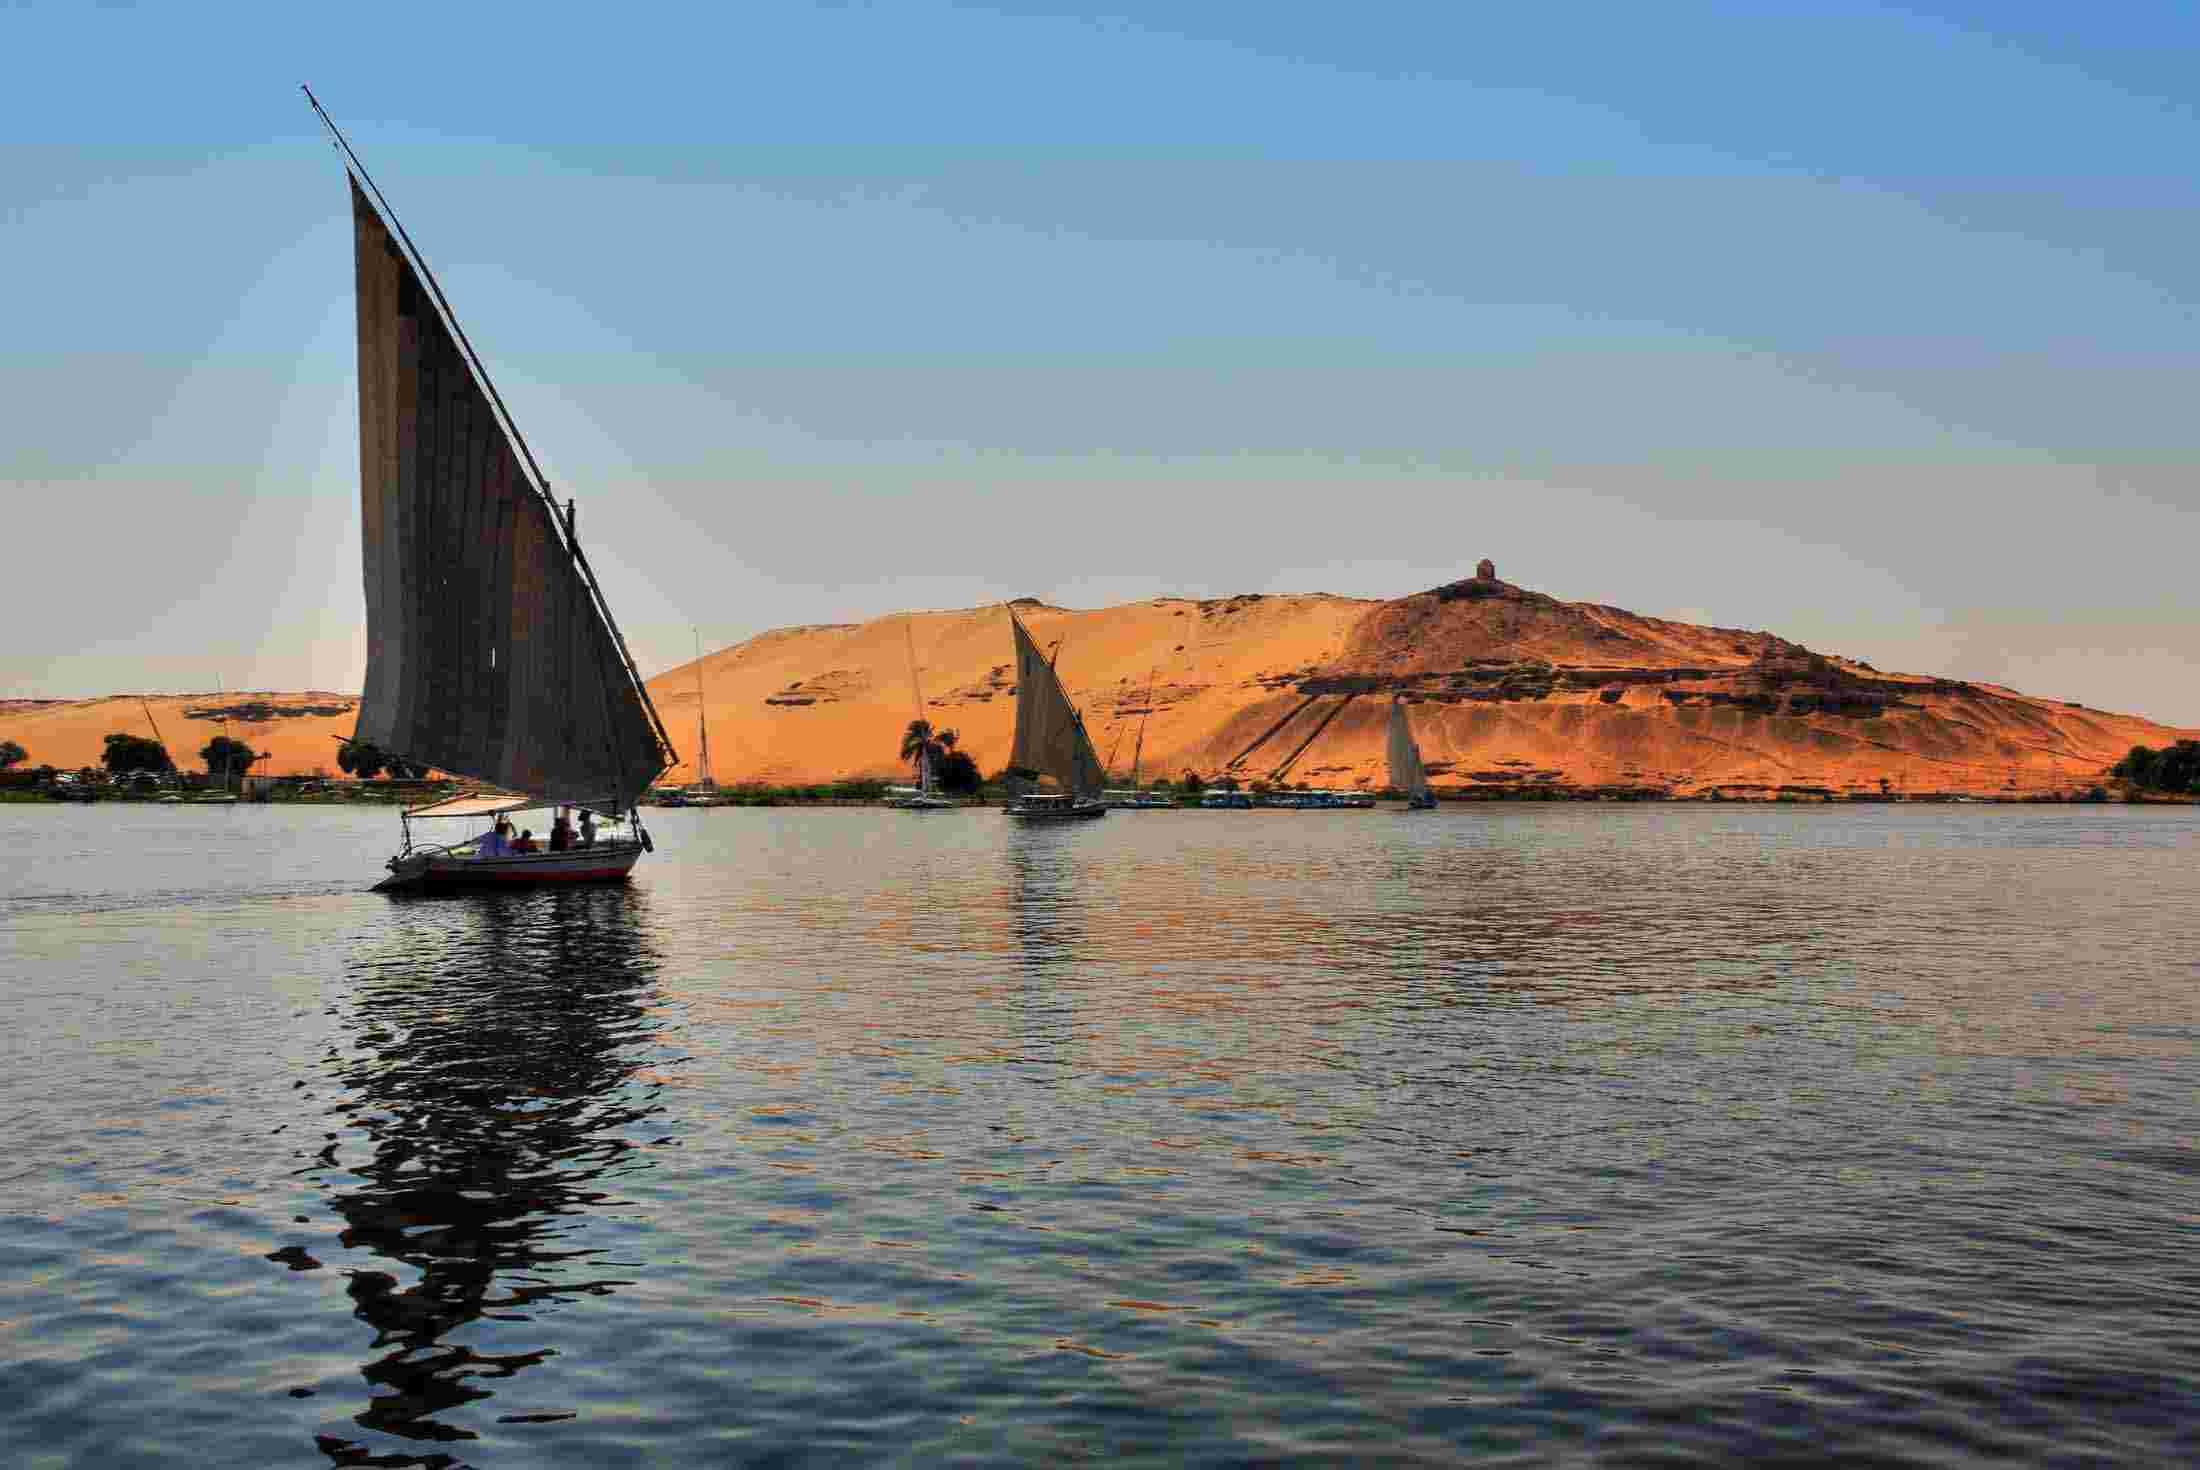 Photo of برنامج سياحي في مصر لزيارة أفضل الأماكن والمعالم السياحية الشهيرة بمصر